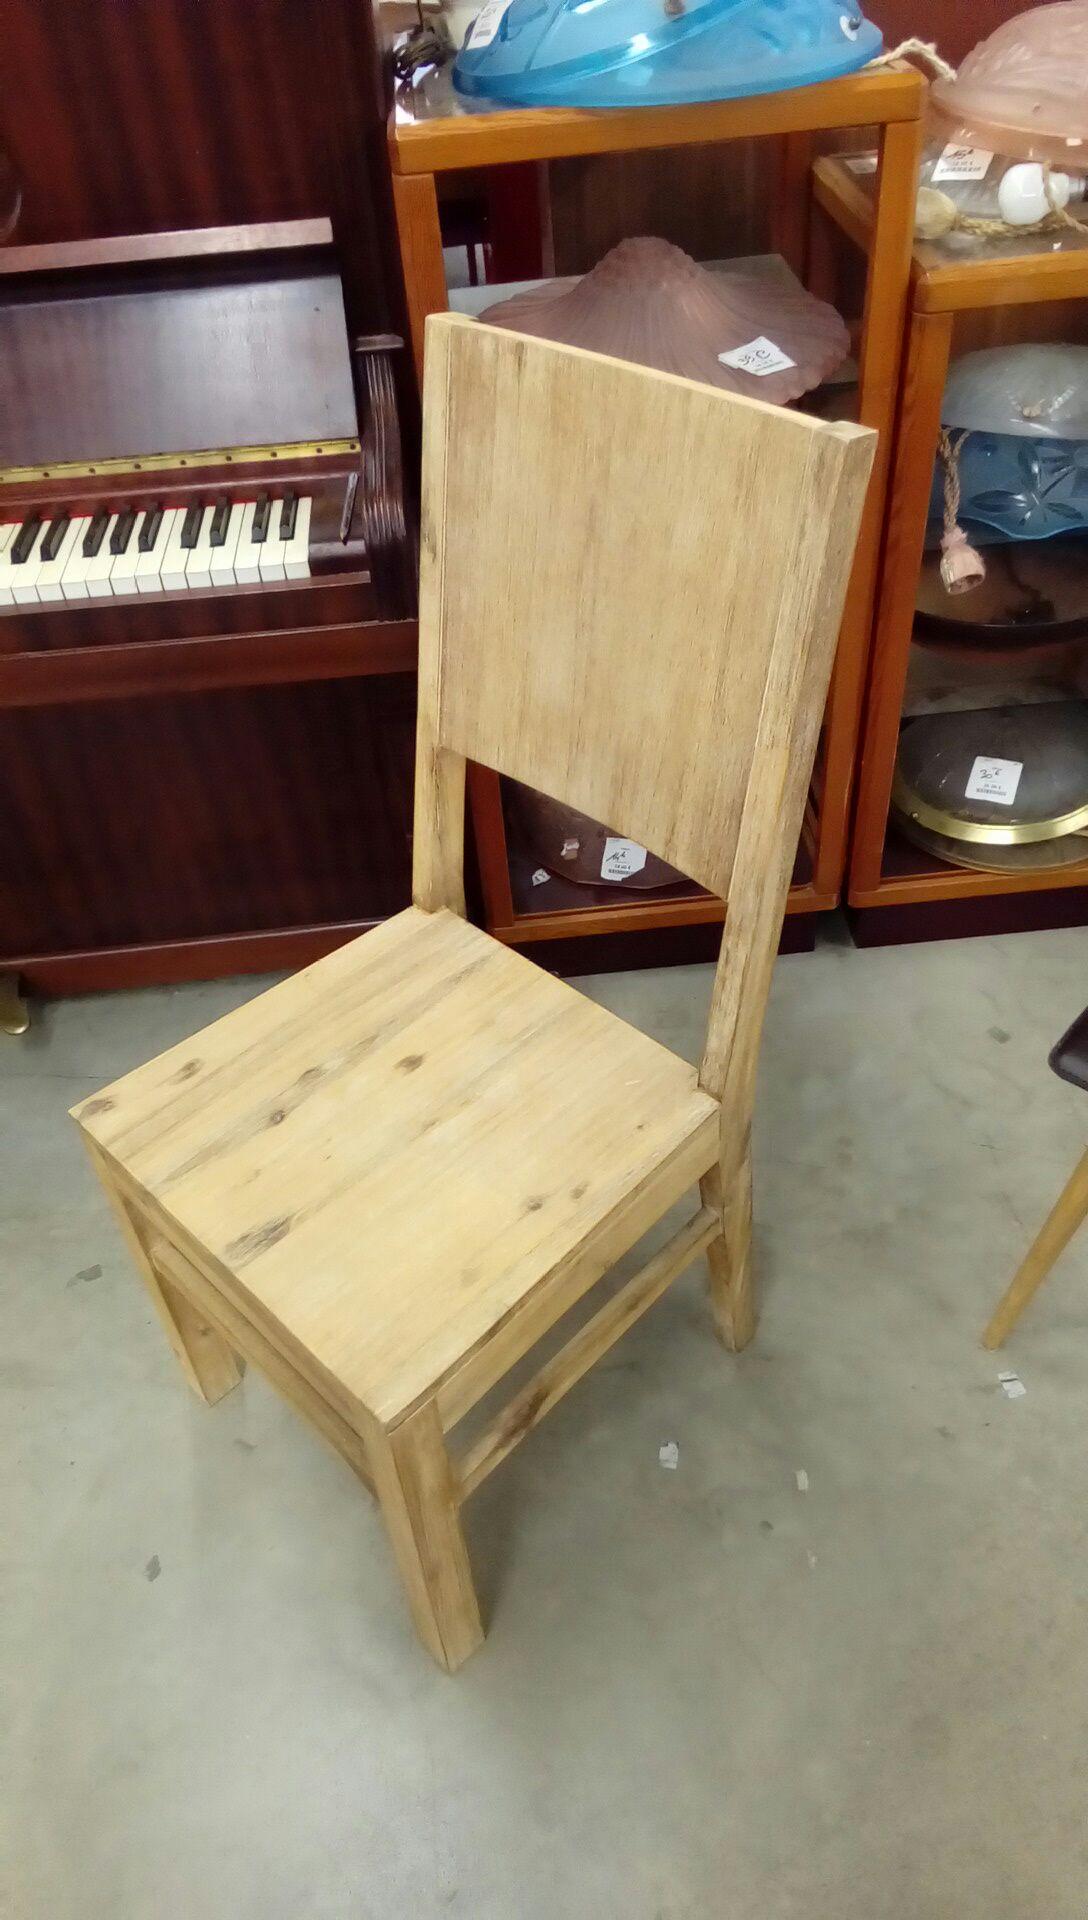 chaise bois occasion troc nancy. Black Bedroom Furniture Sets. Home Design Ideas